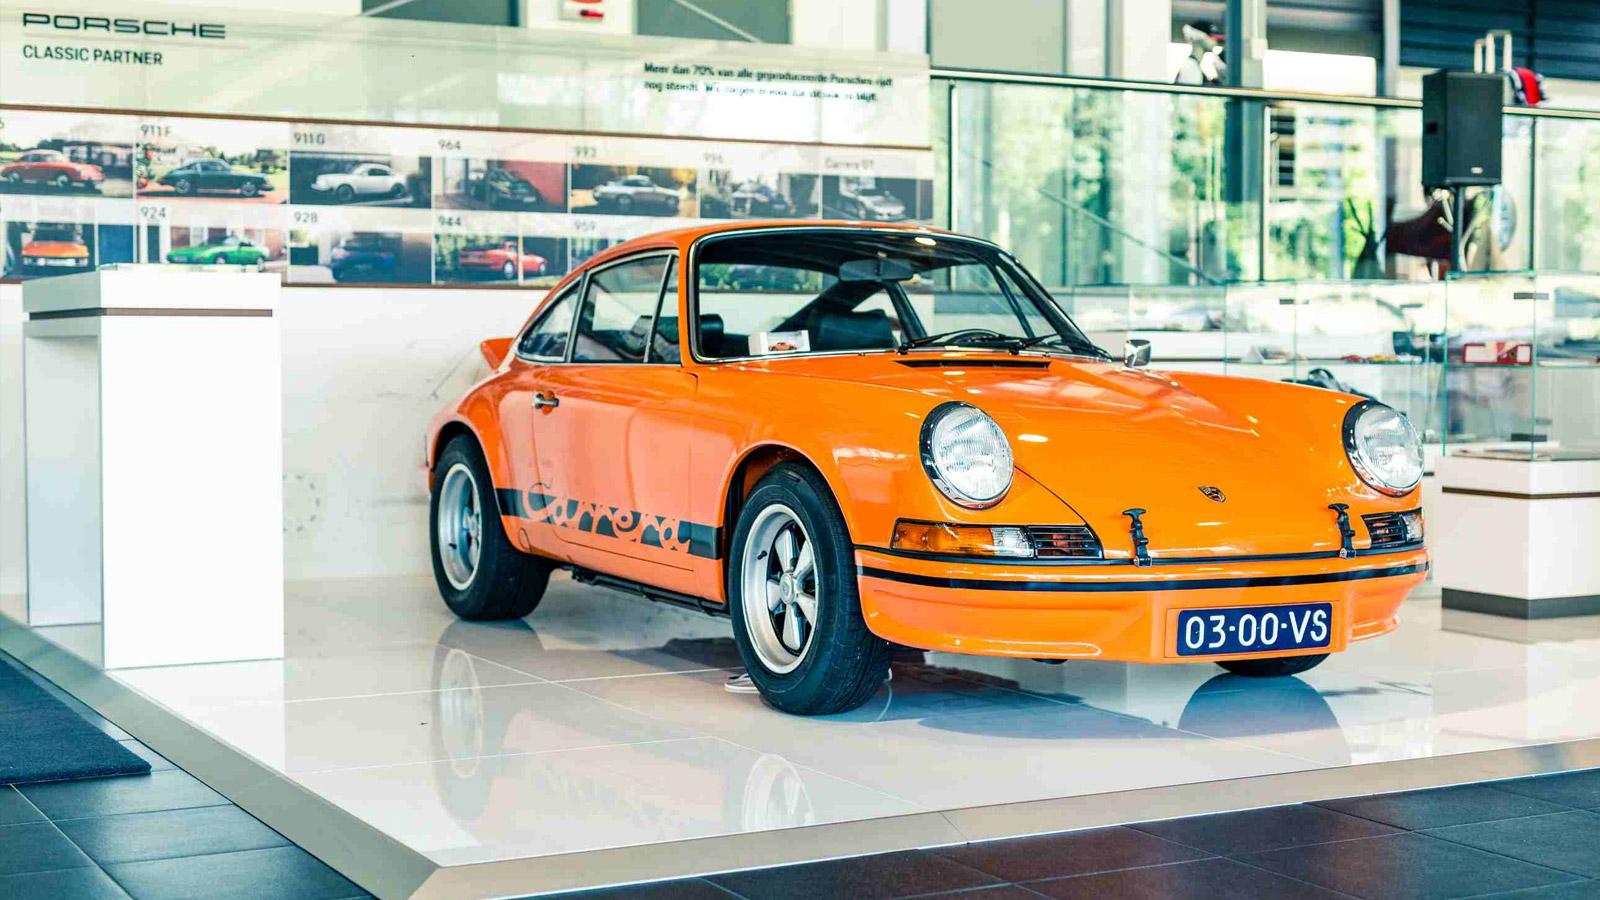 Porsche - Порше Центр Leusden